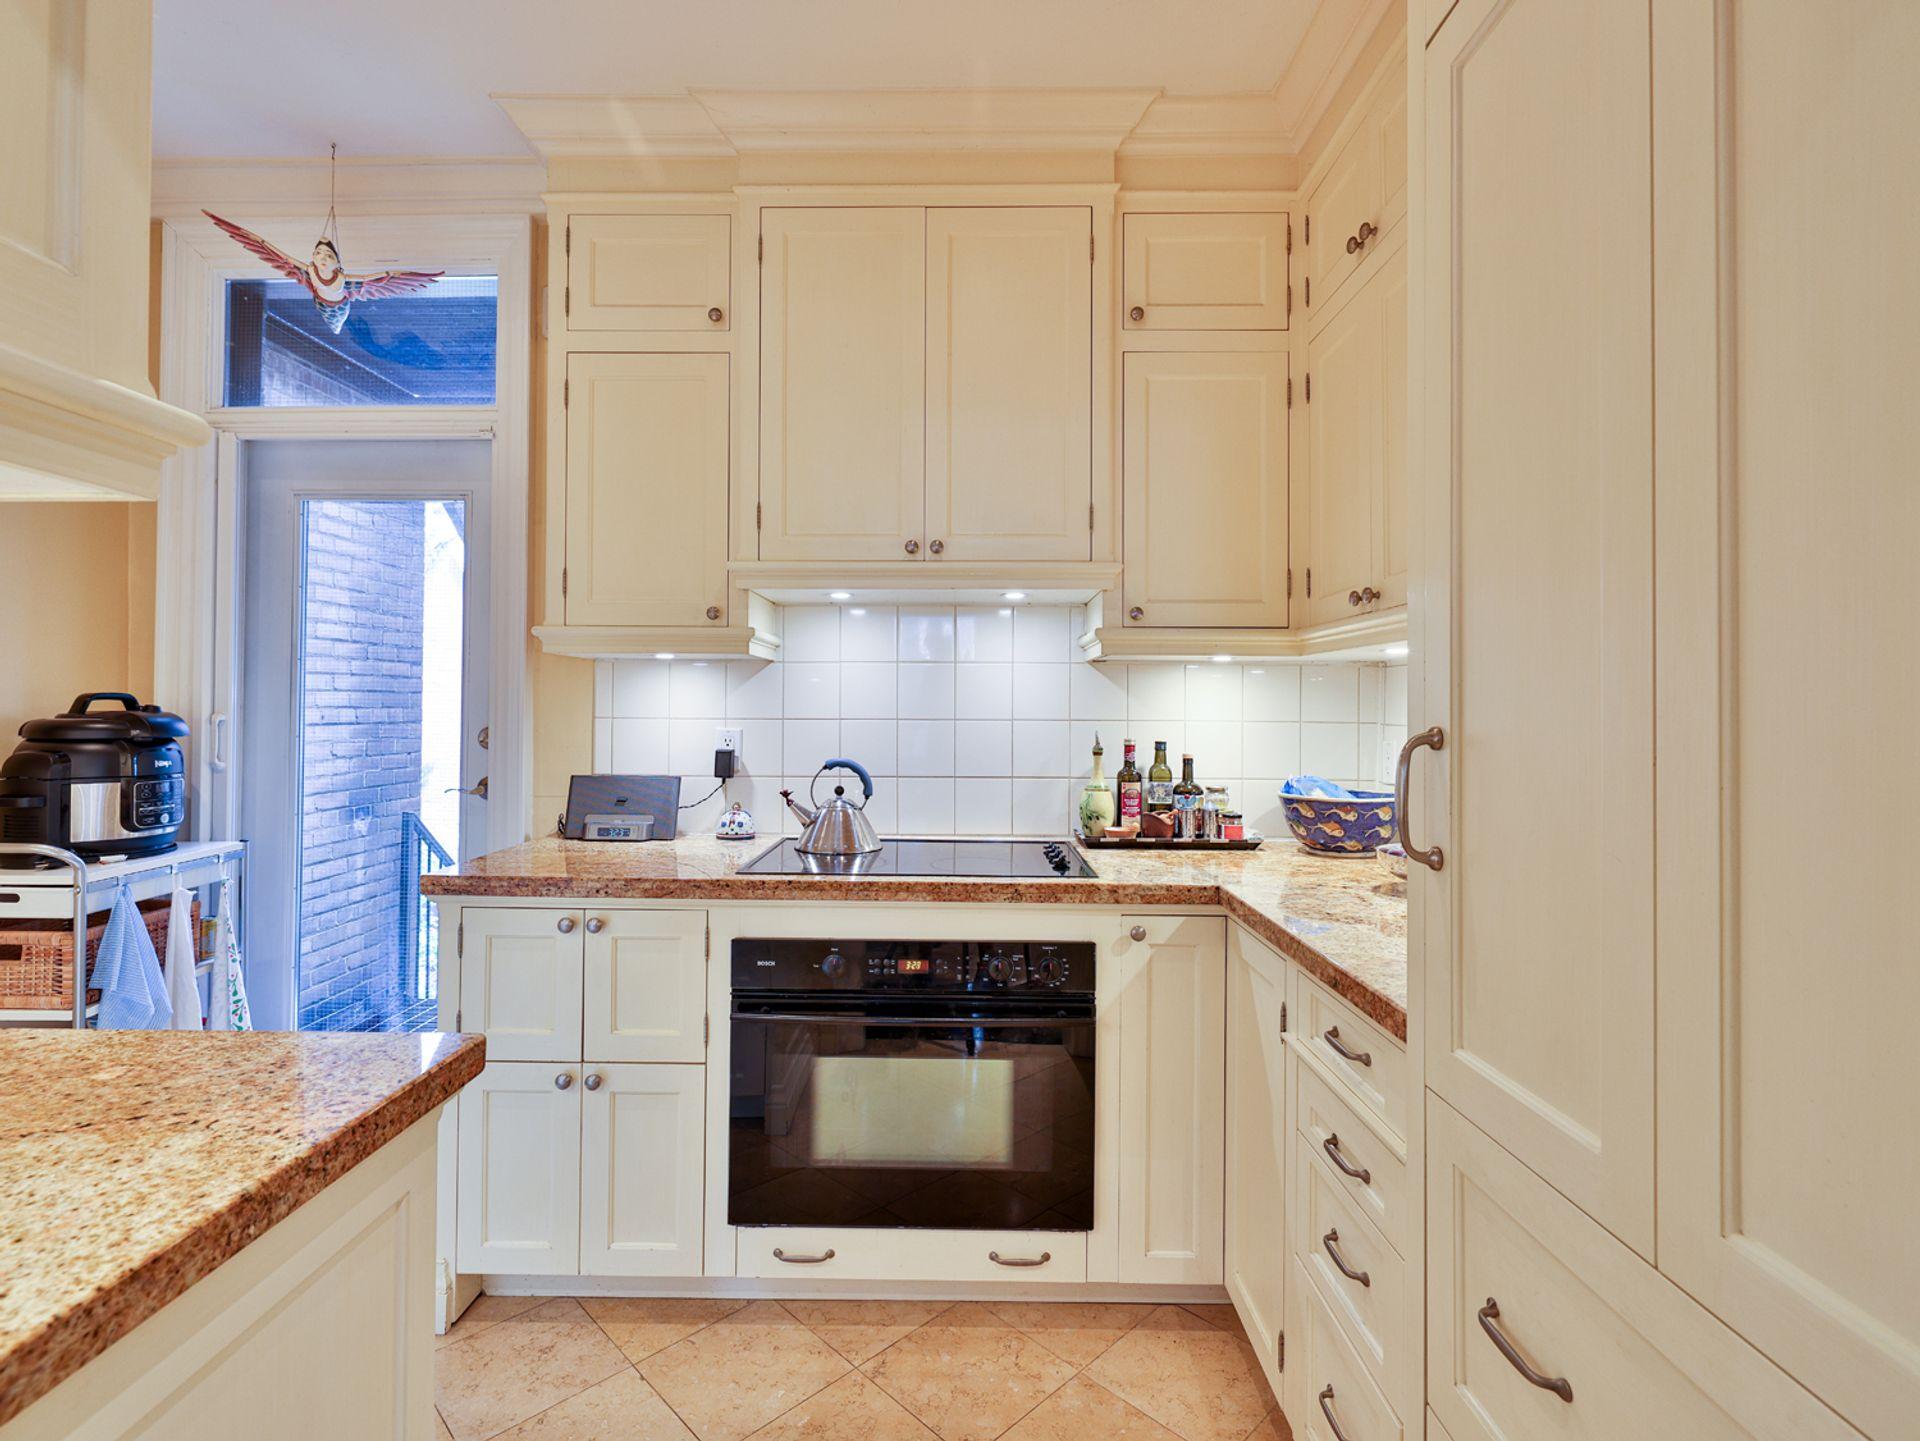 Kitchen at 305 - 150 St. Clair Avenue W, Yonge-St. Clair, Toronto